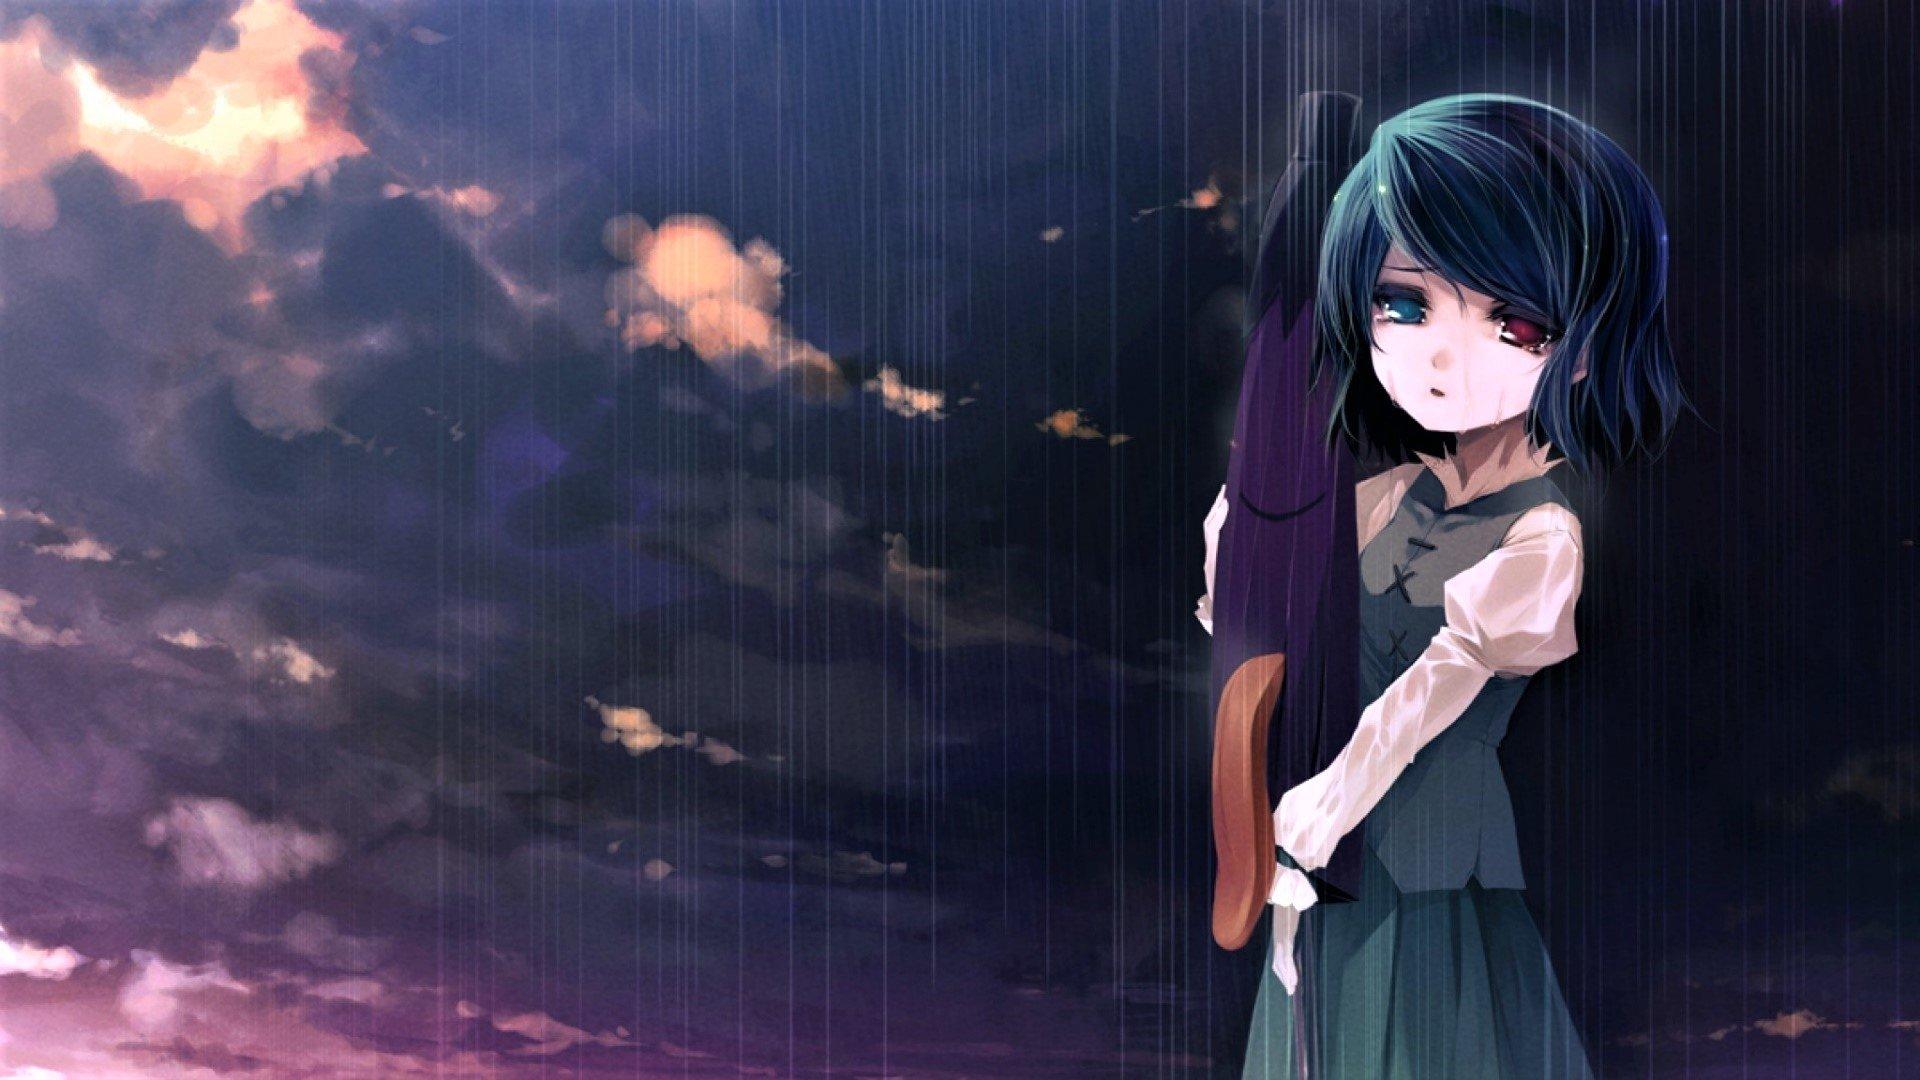 Sad Anime Girl In The Rain Hd Wallpaper Background Image